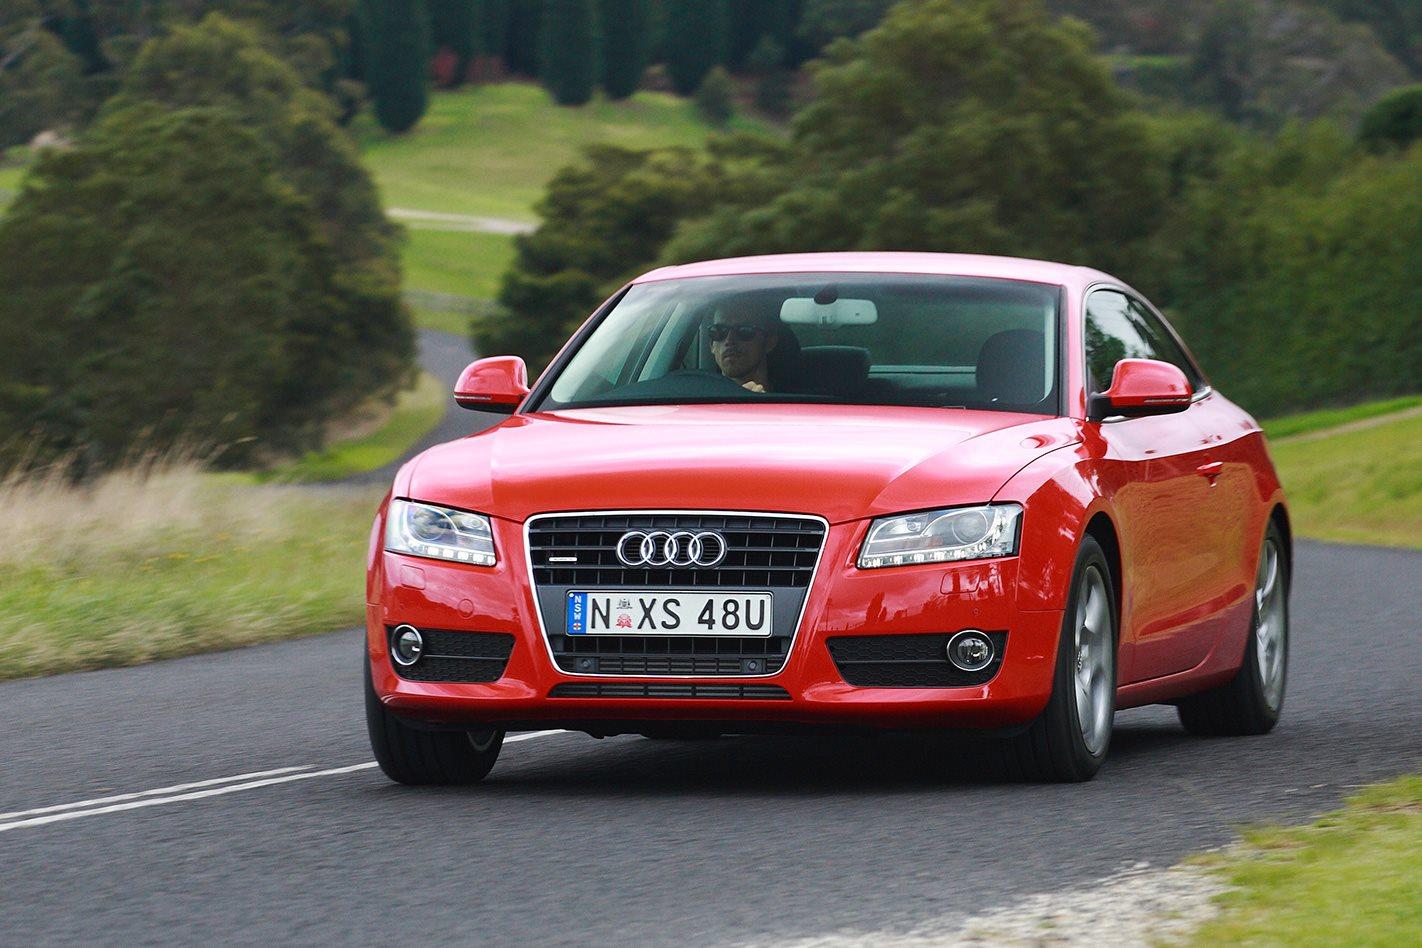 Kelebihan Audi A5 2009 Murah Berkualitas